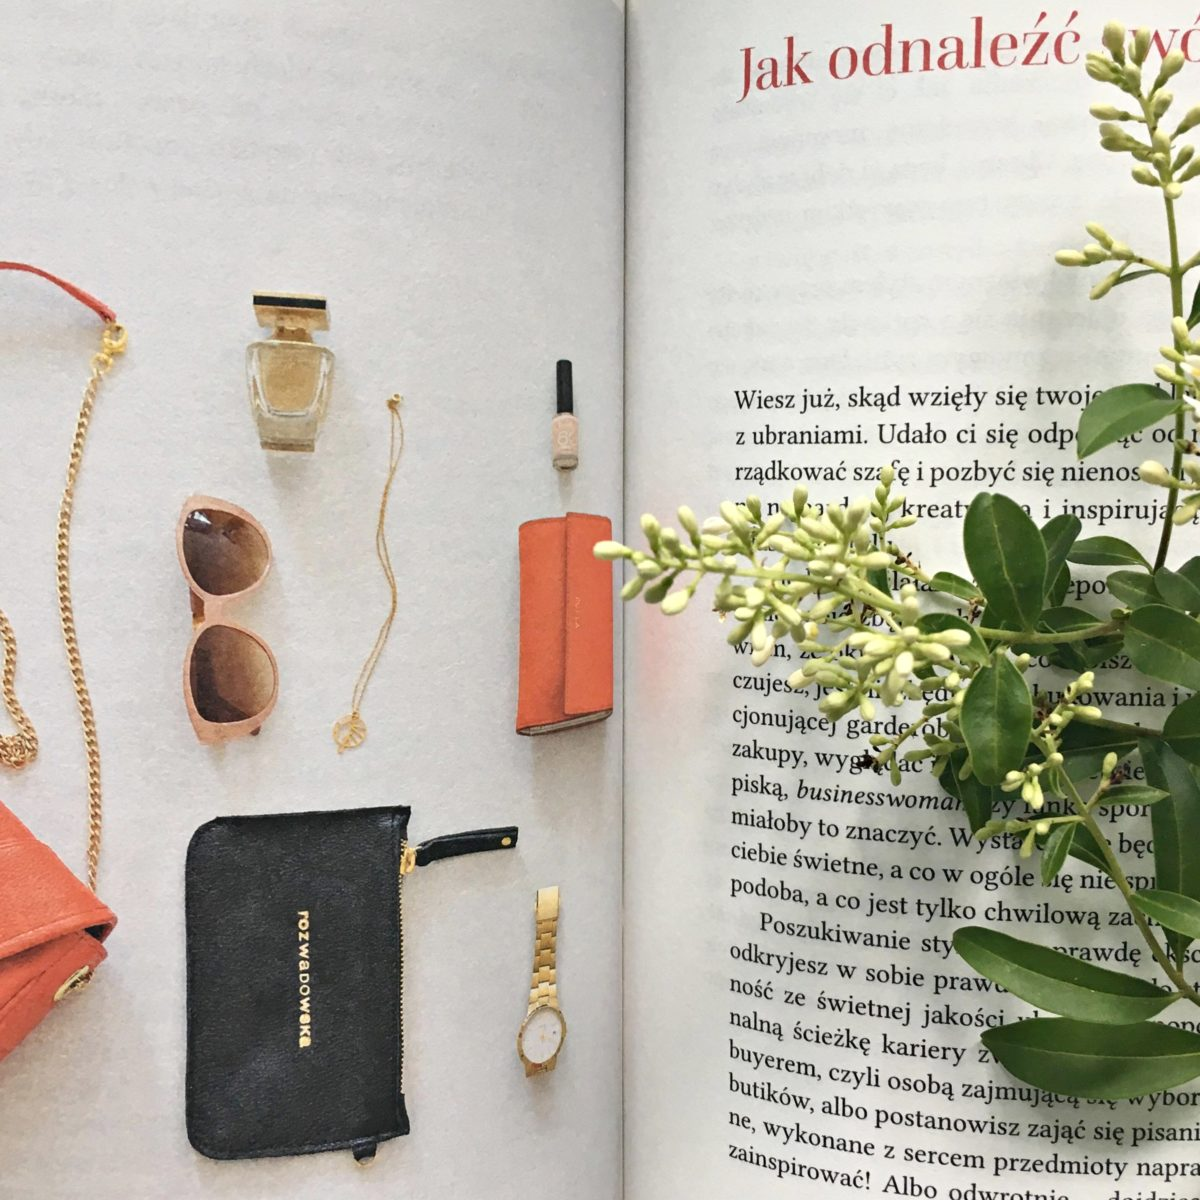 Slow-fashion-glogaza-fragment annemarie